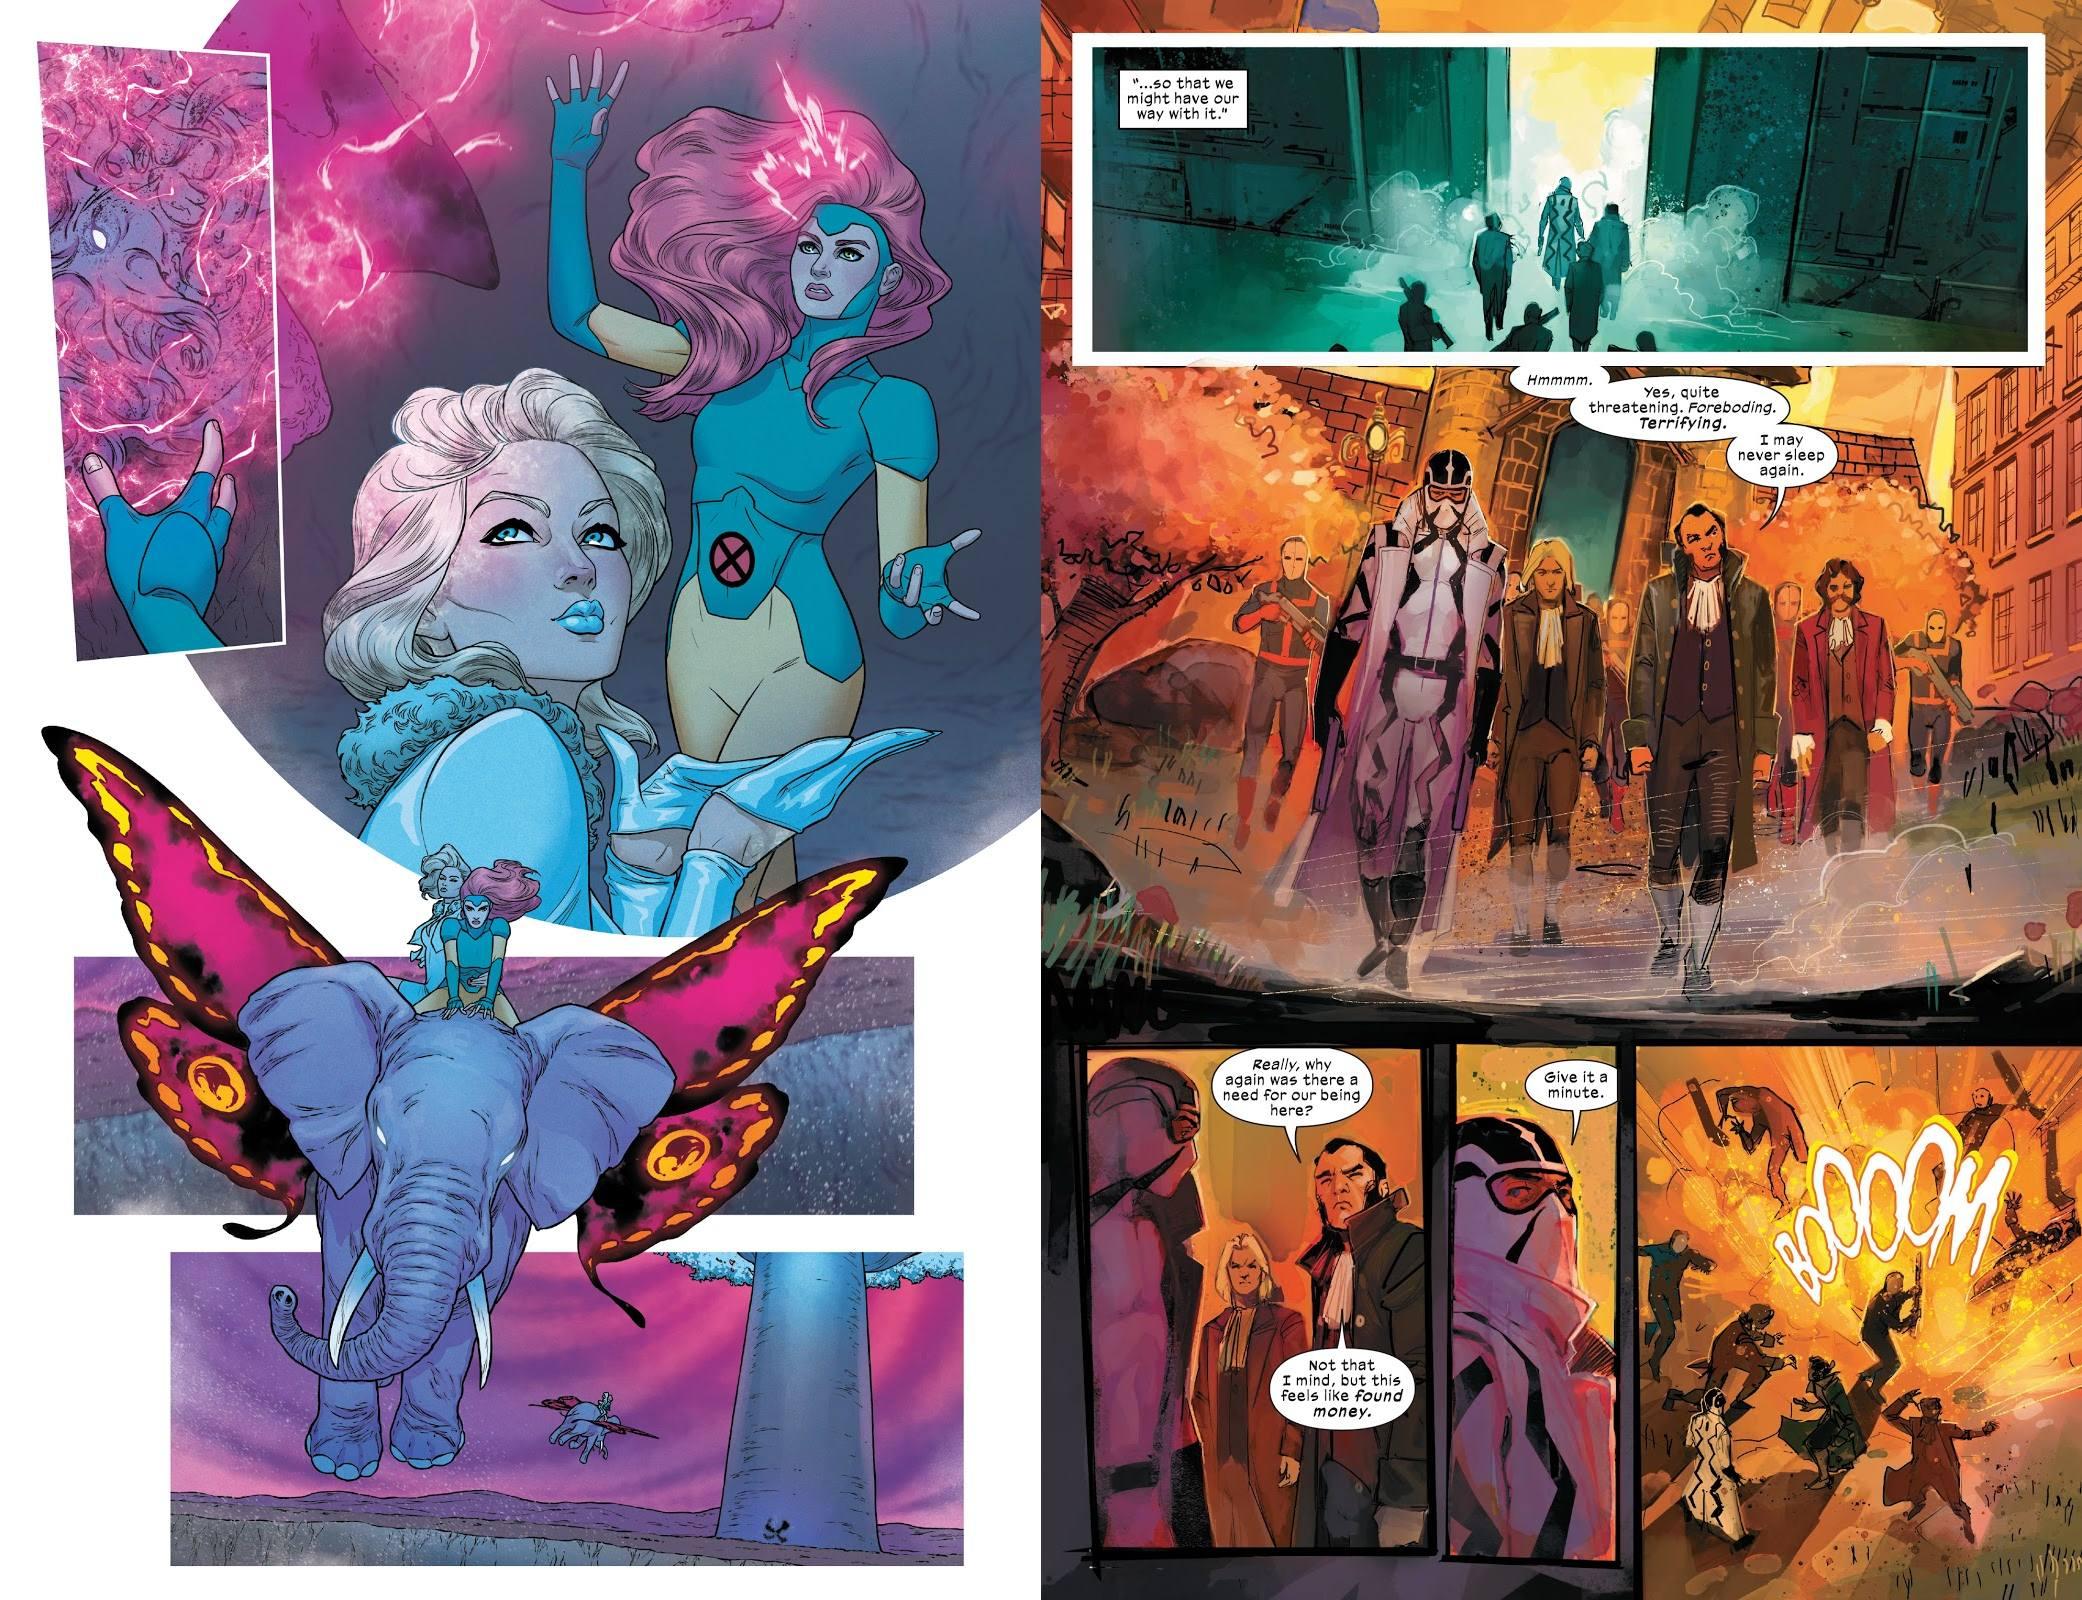 Giant Size X-Men review